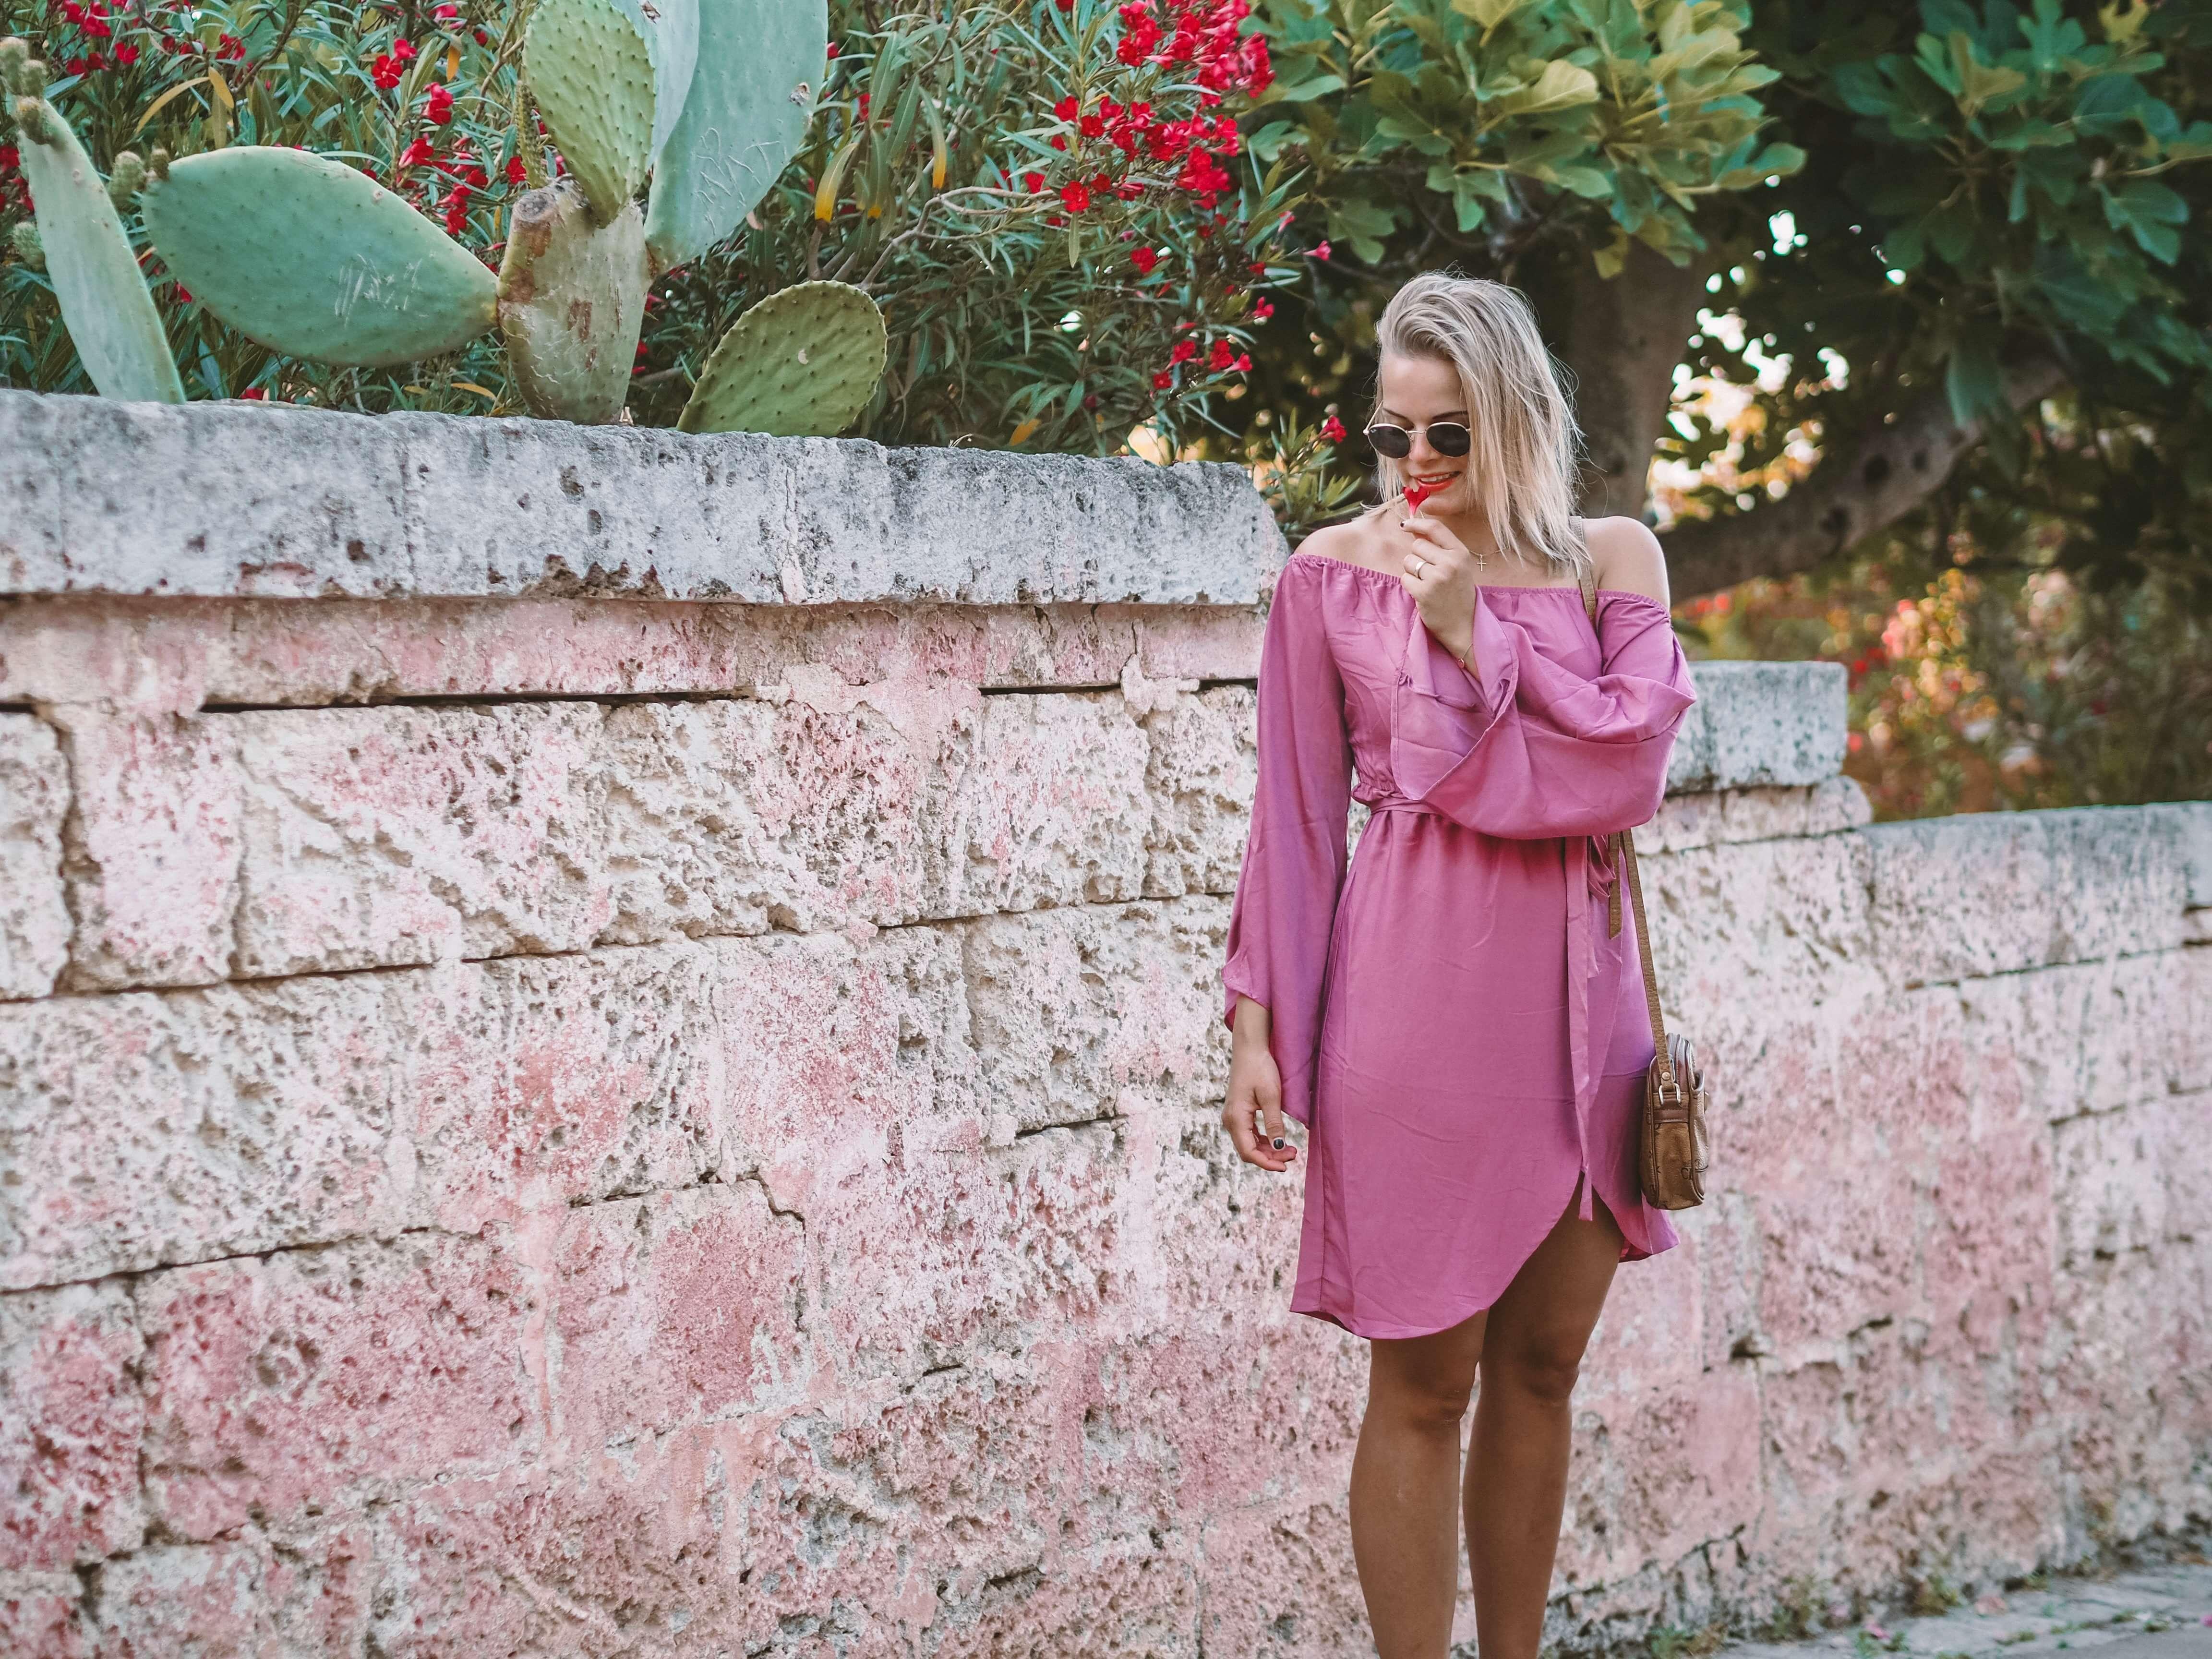 Off Shoulder Kleid, kurzes Sommerkleid kombinieren, Sommerkleid, Outfit, Kleid, Streetstyle, Sommerlook, Fashion, Fashionblogger